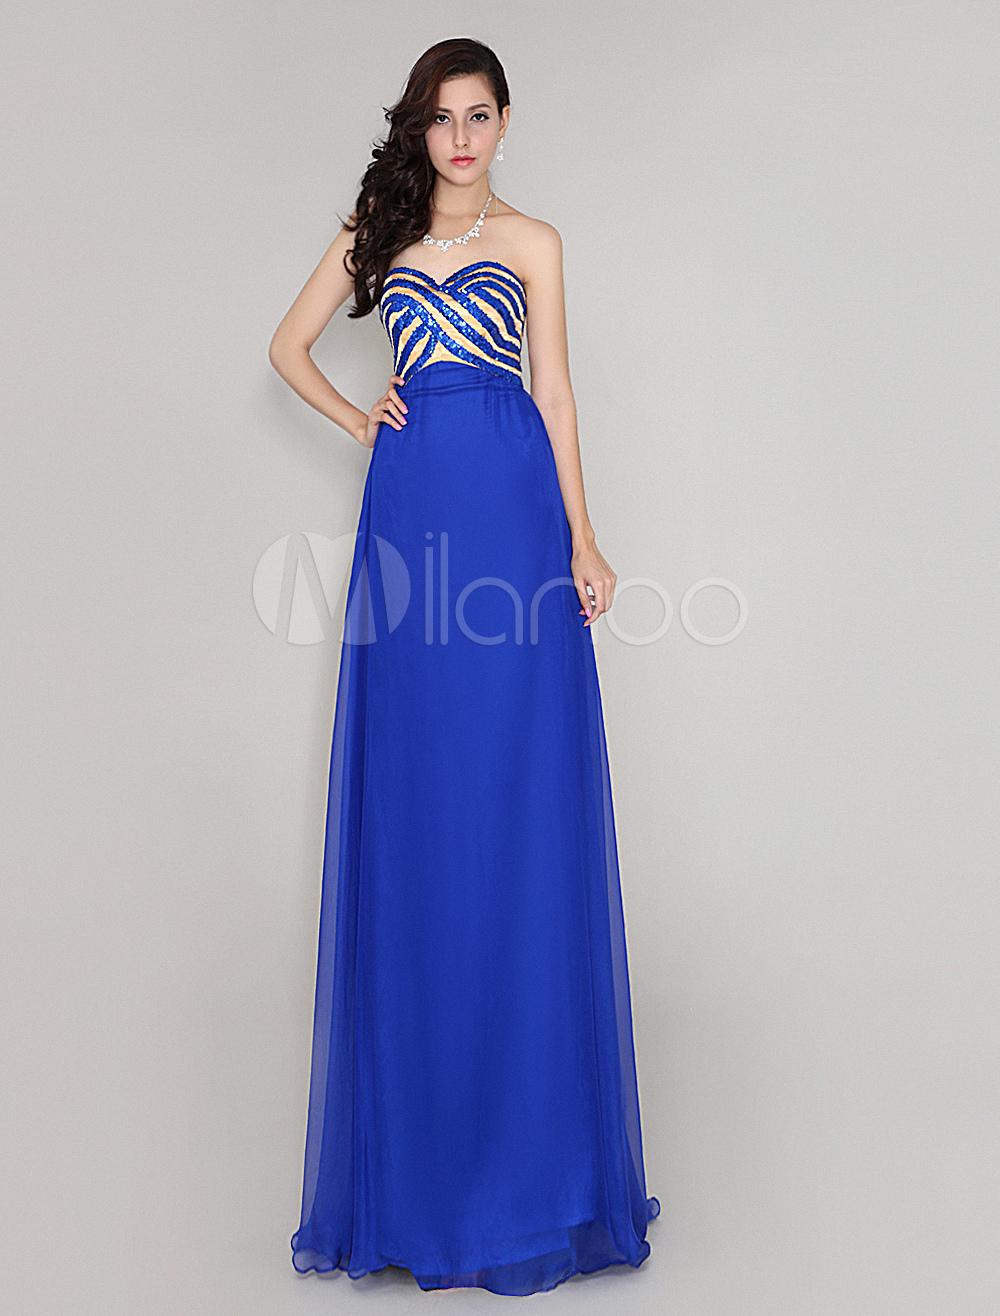 Royal Blue 30D Chiffon Sequined Prom Dress (Wedding Cheap Party Dress) photo